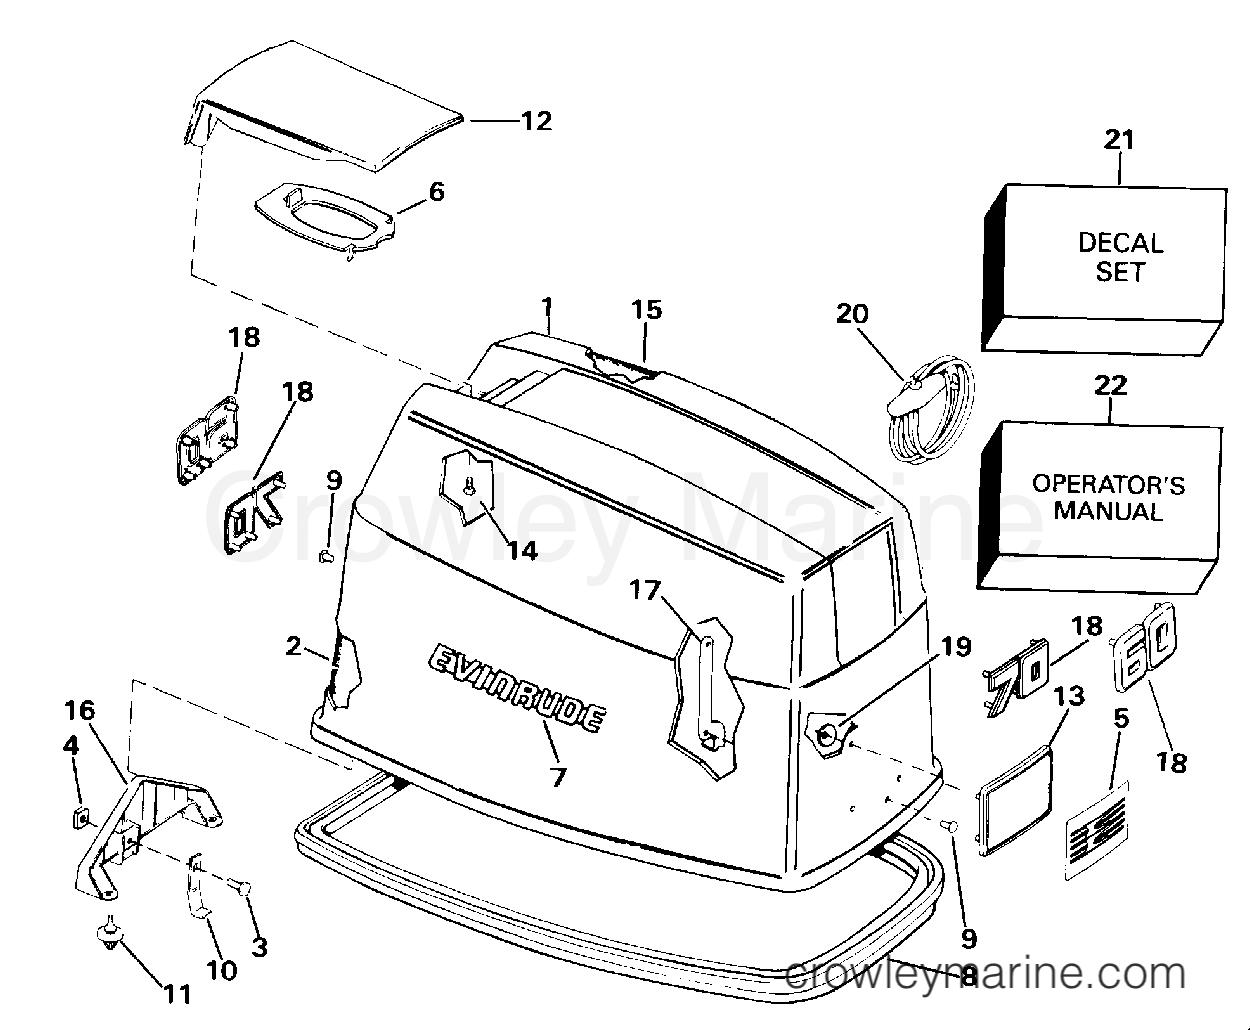 evinrude 70 wiring diagram database Evinrude Schematics engine cover evinrude 1993 evinrude outboards 70 e70tlets evinrude outboard 1993 evinrude outboards 70 e70tlets engine